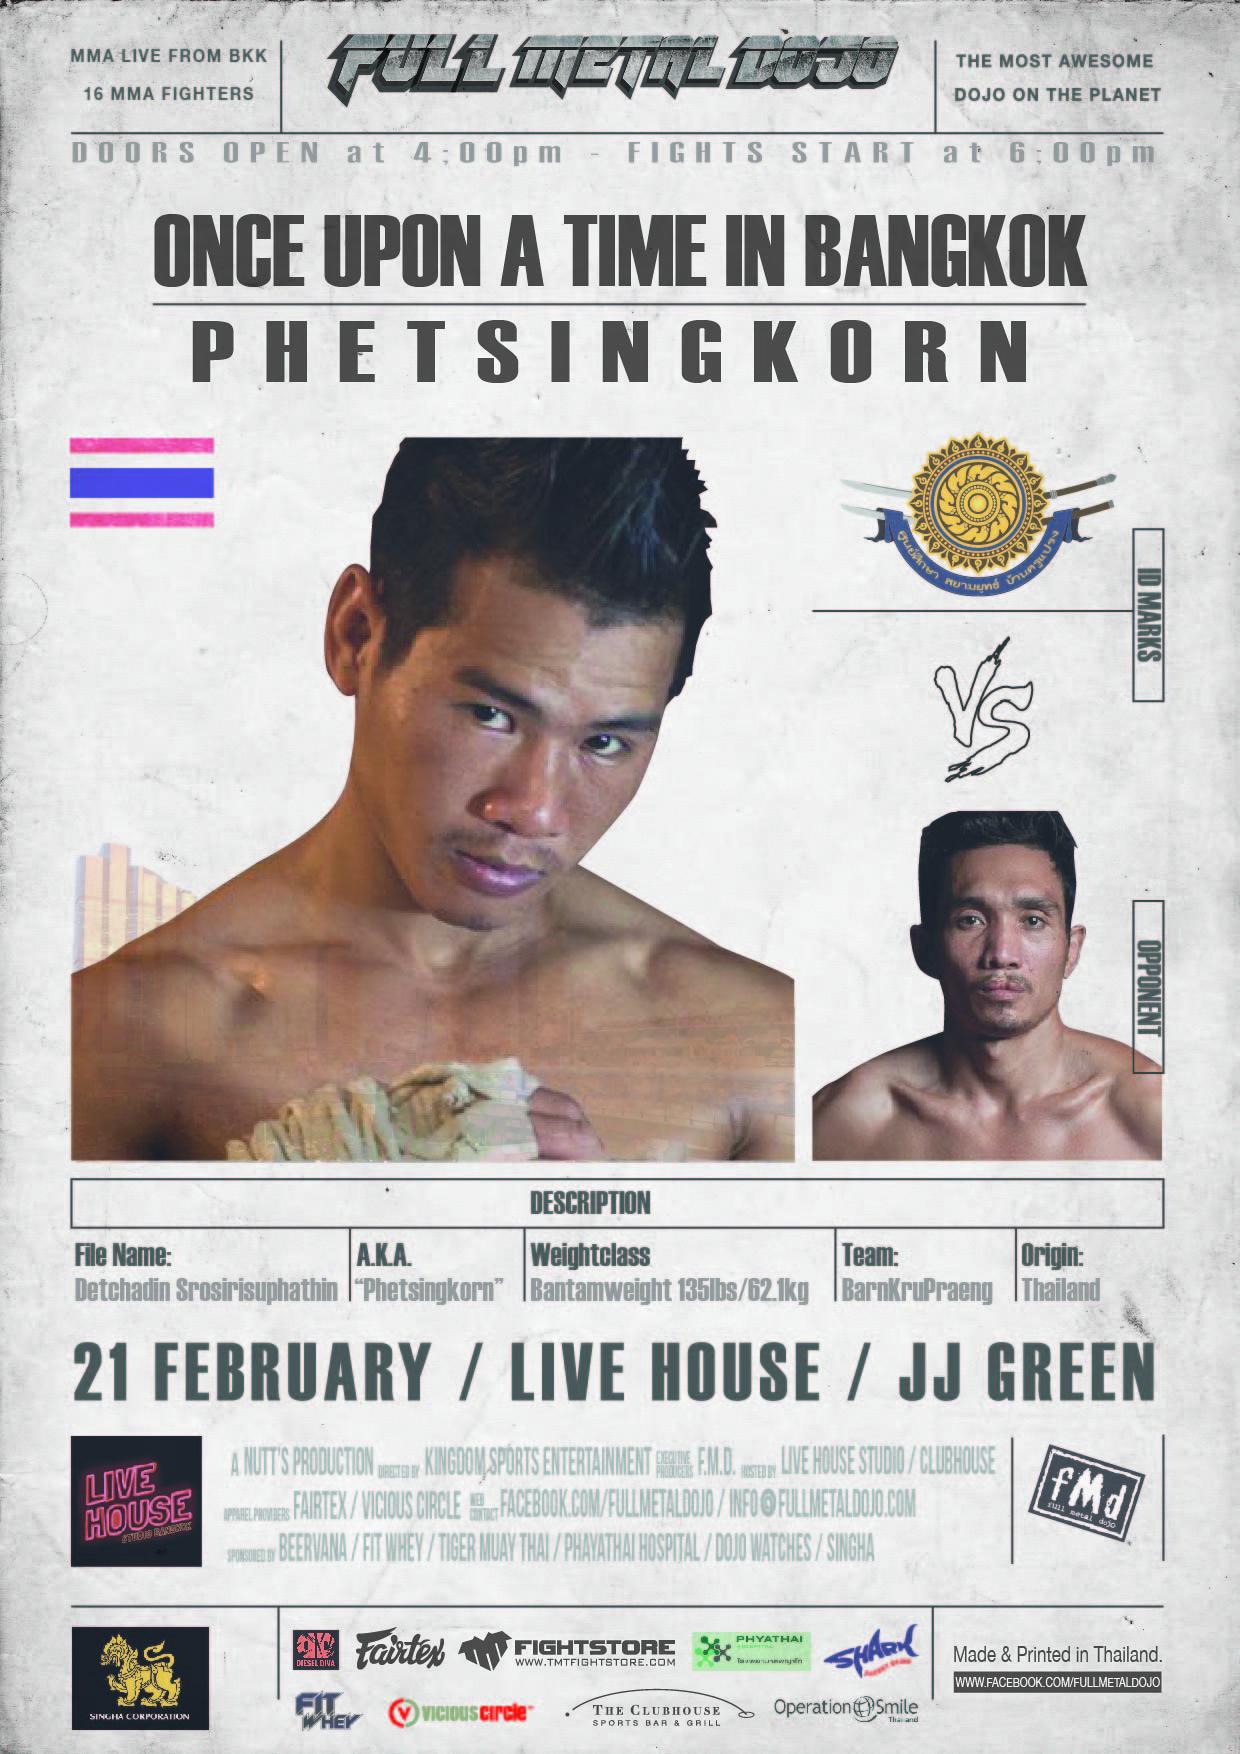 Detchadin Phetsingkorn Srosirisuphathin FMD4 MMA Fighter